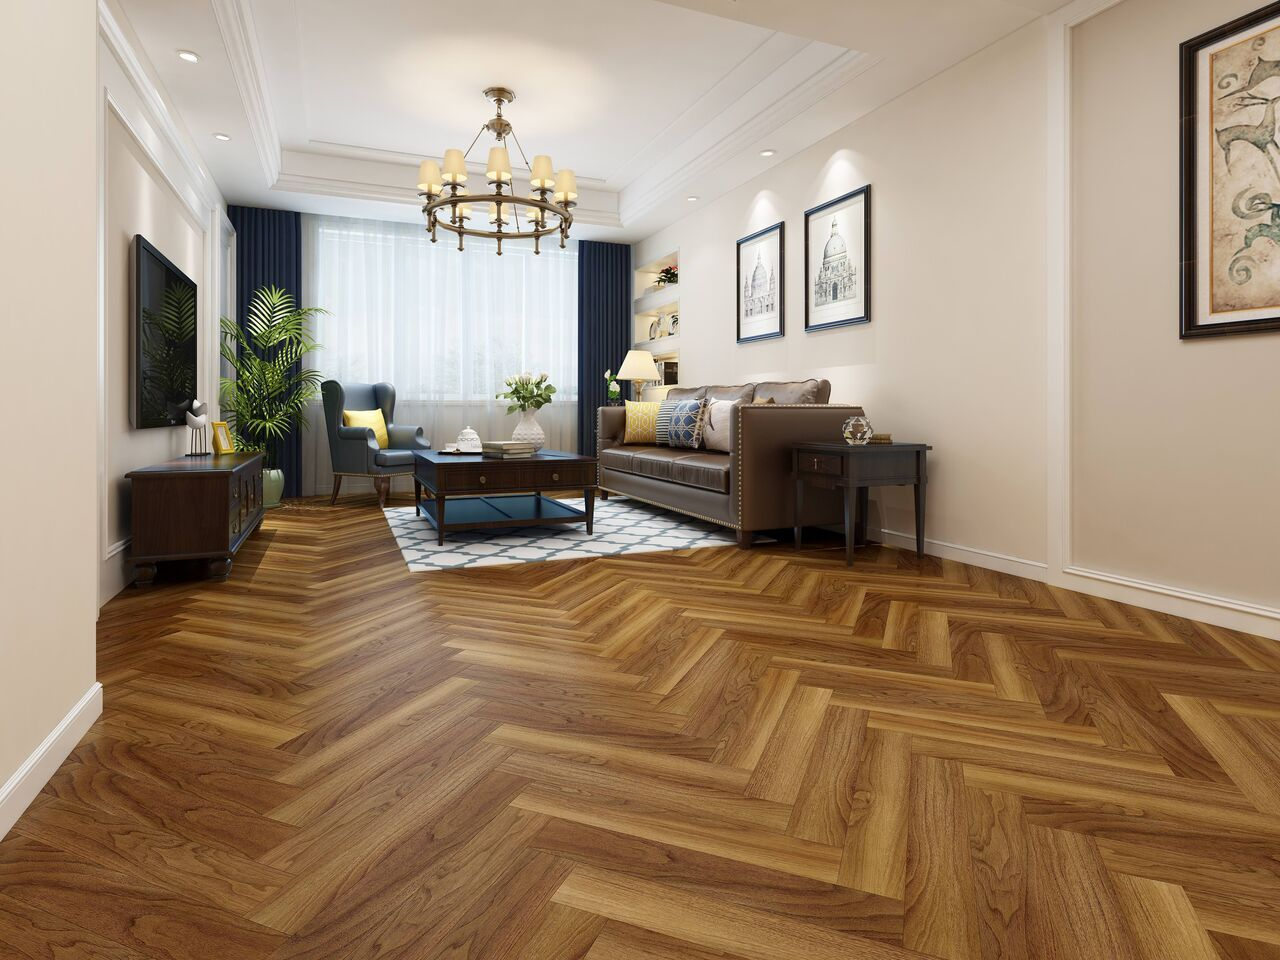 New Herringbone Laminate Flooring Coming Soon